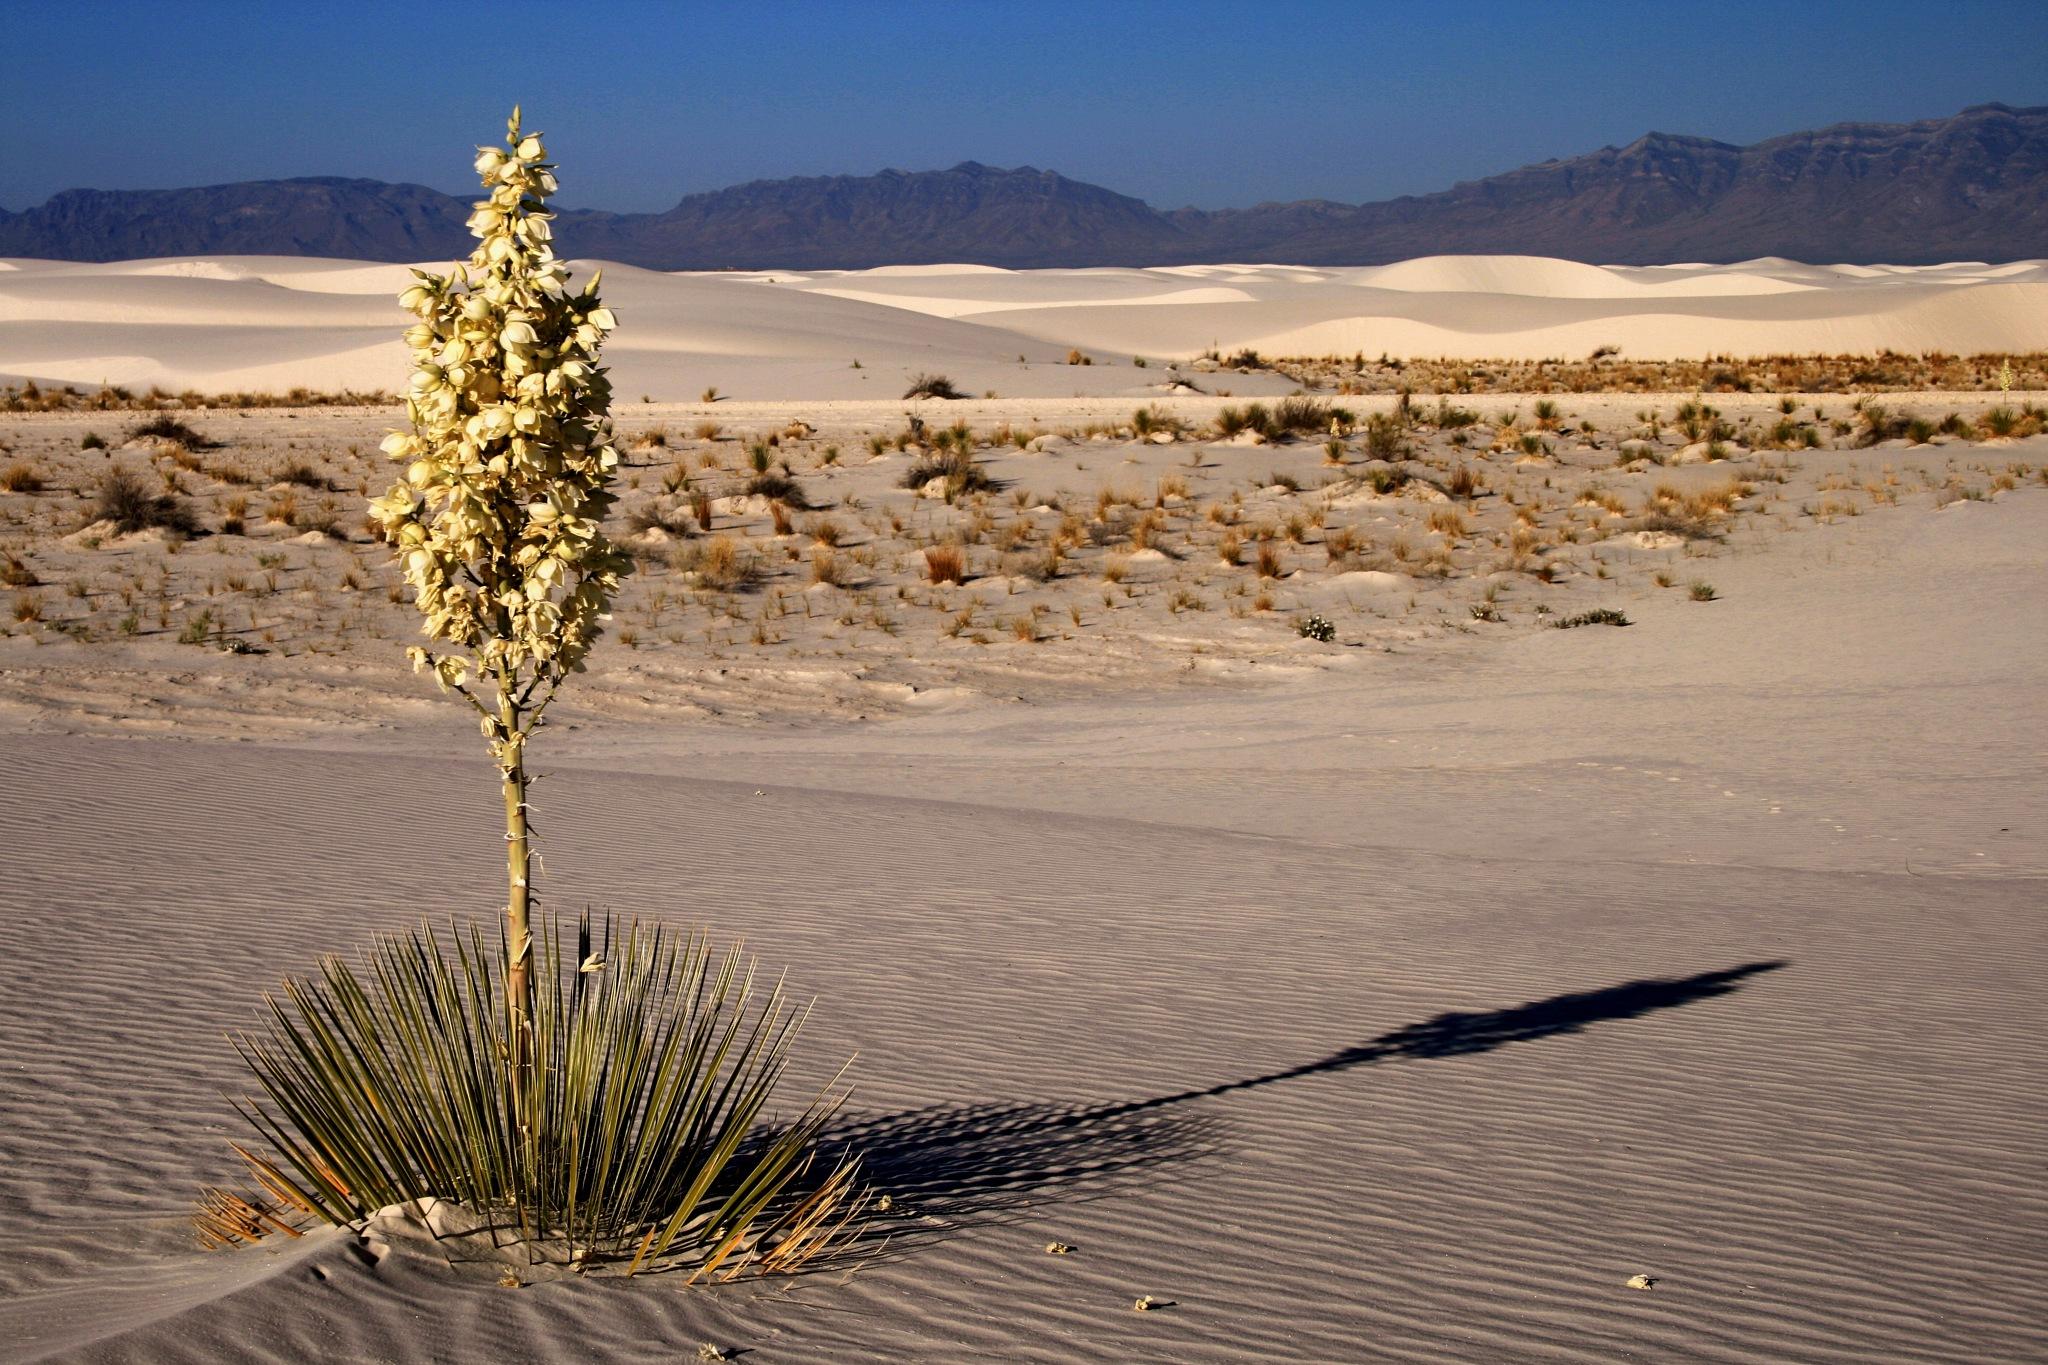 Yacca and White Sand by daniel.luna.77920